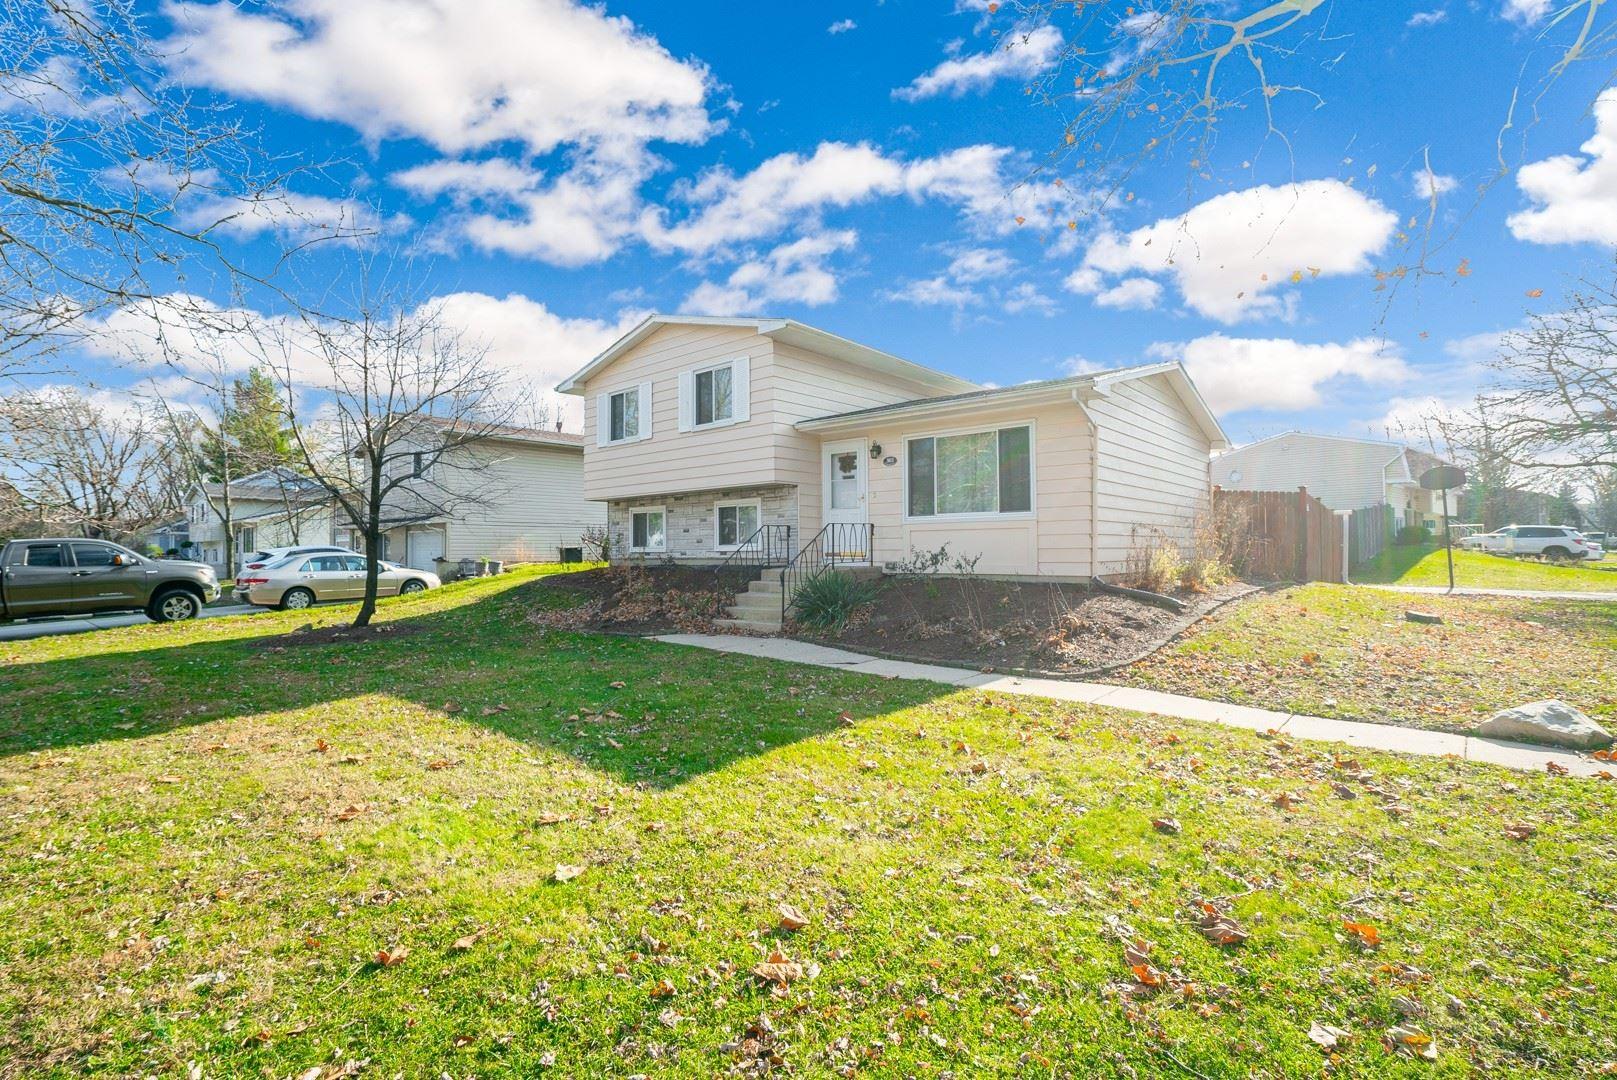 Photo of 365 GEHRIG Circle, Bolingbrook, IL 60440 (MLS # 10940437)